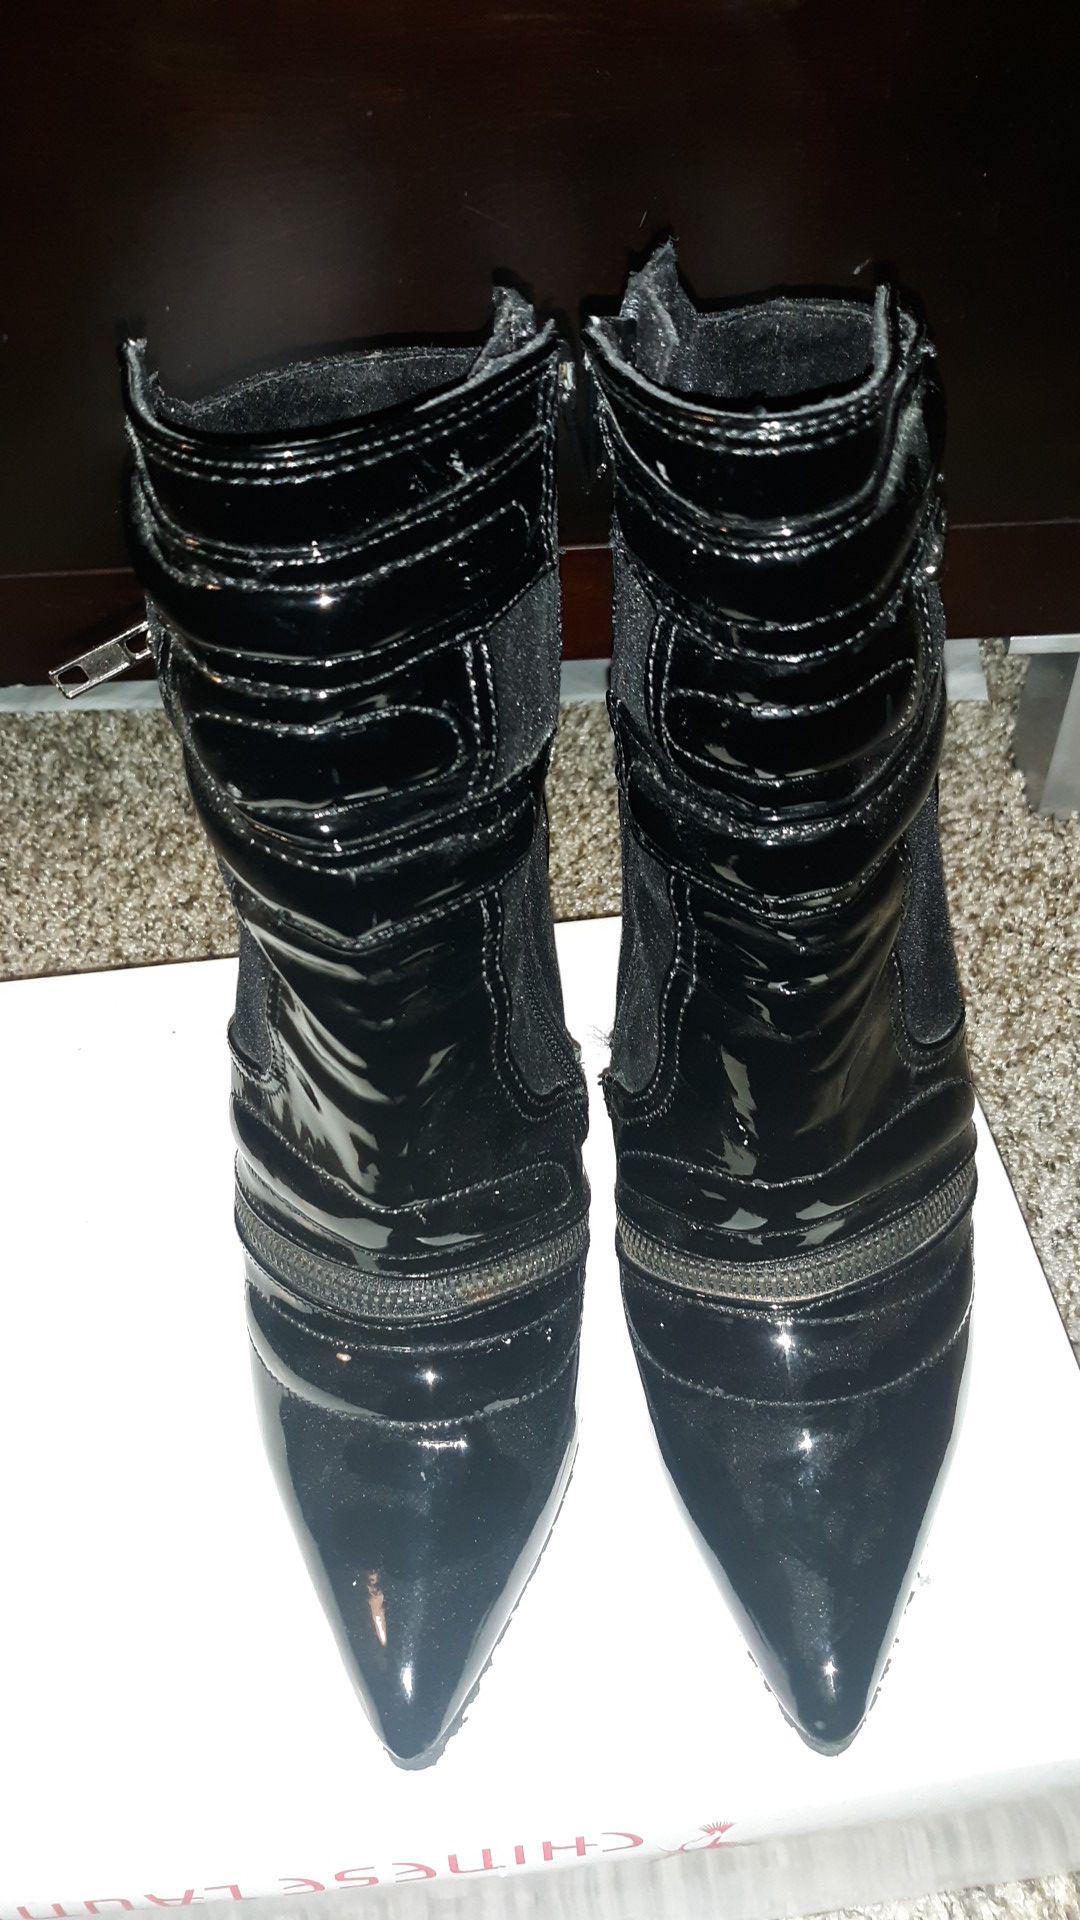 Cool booties